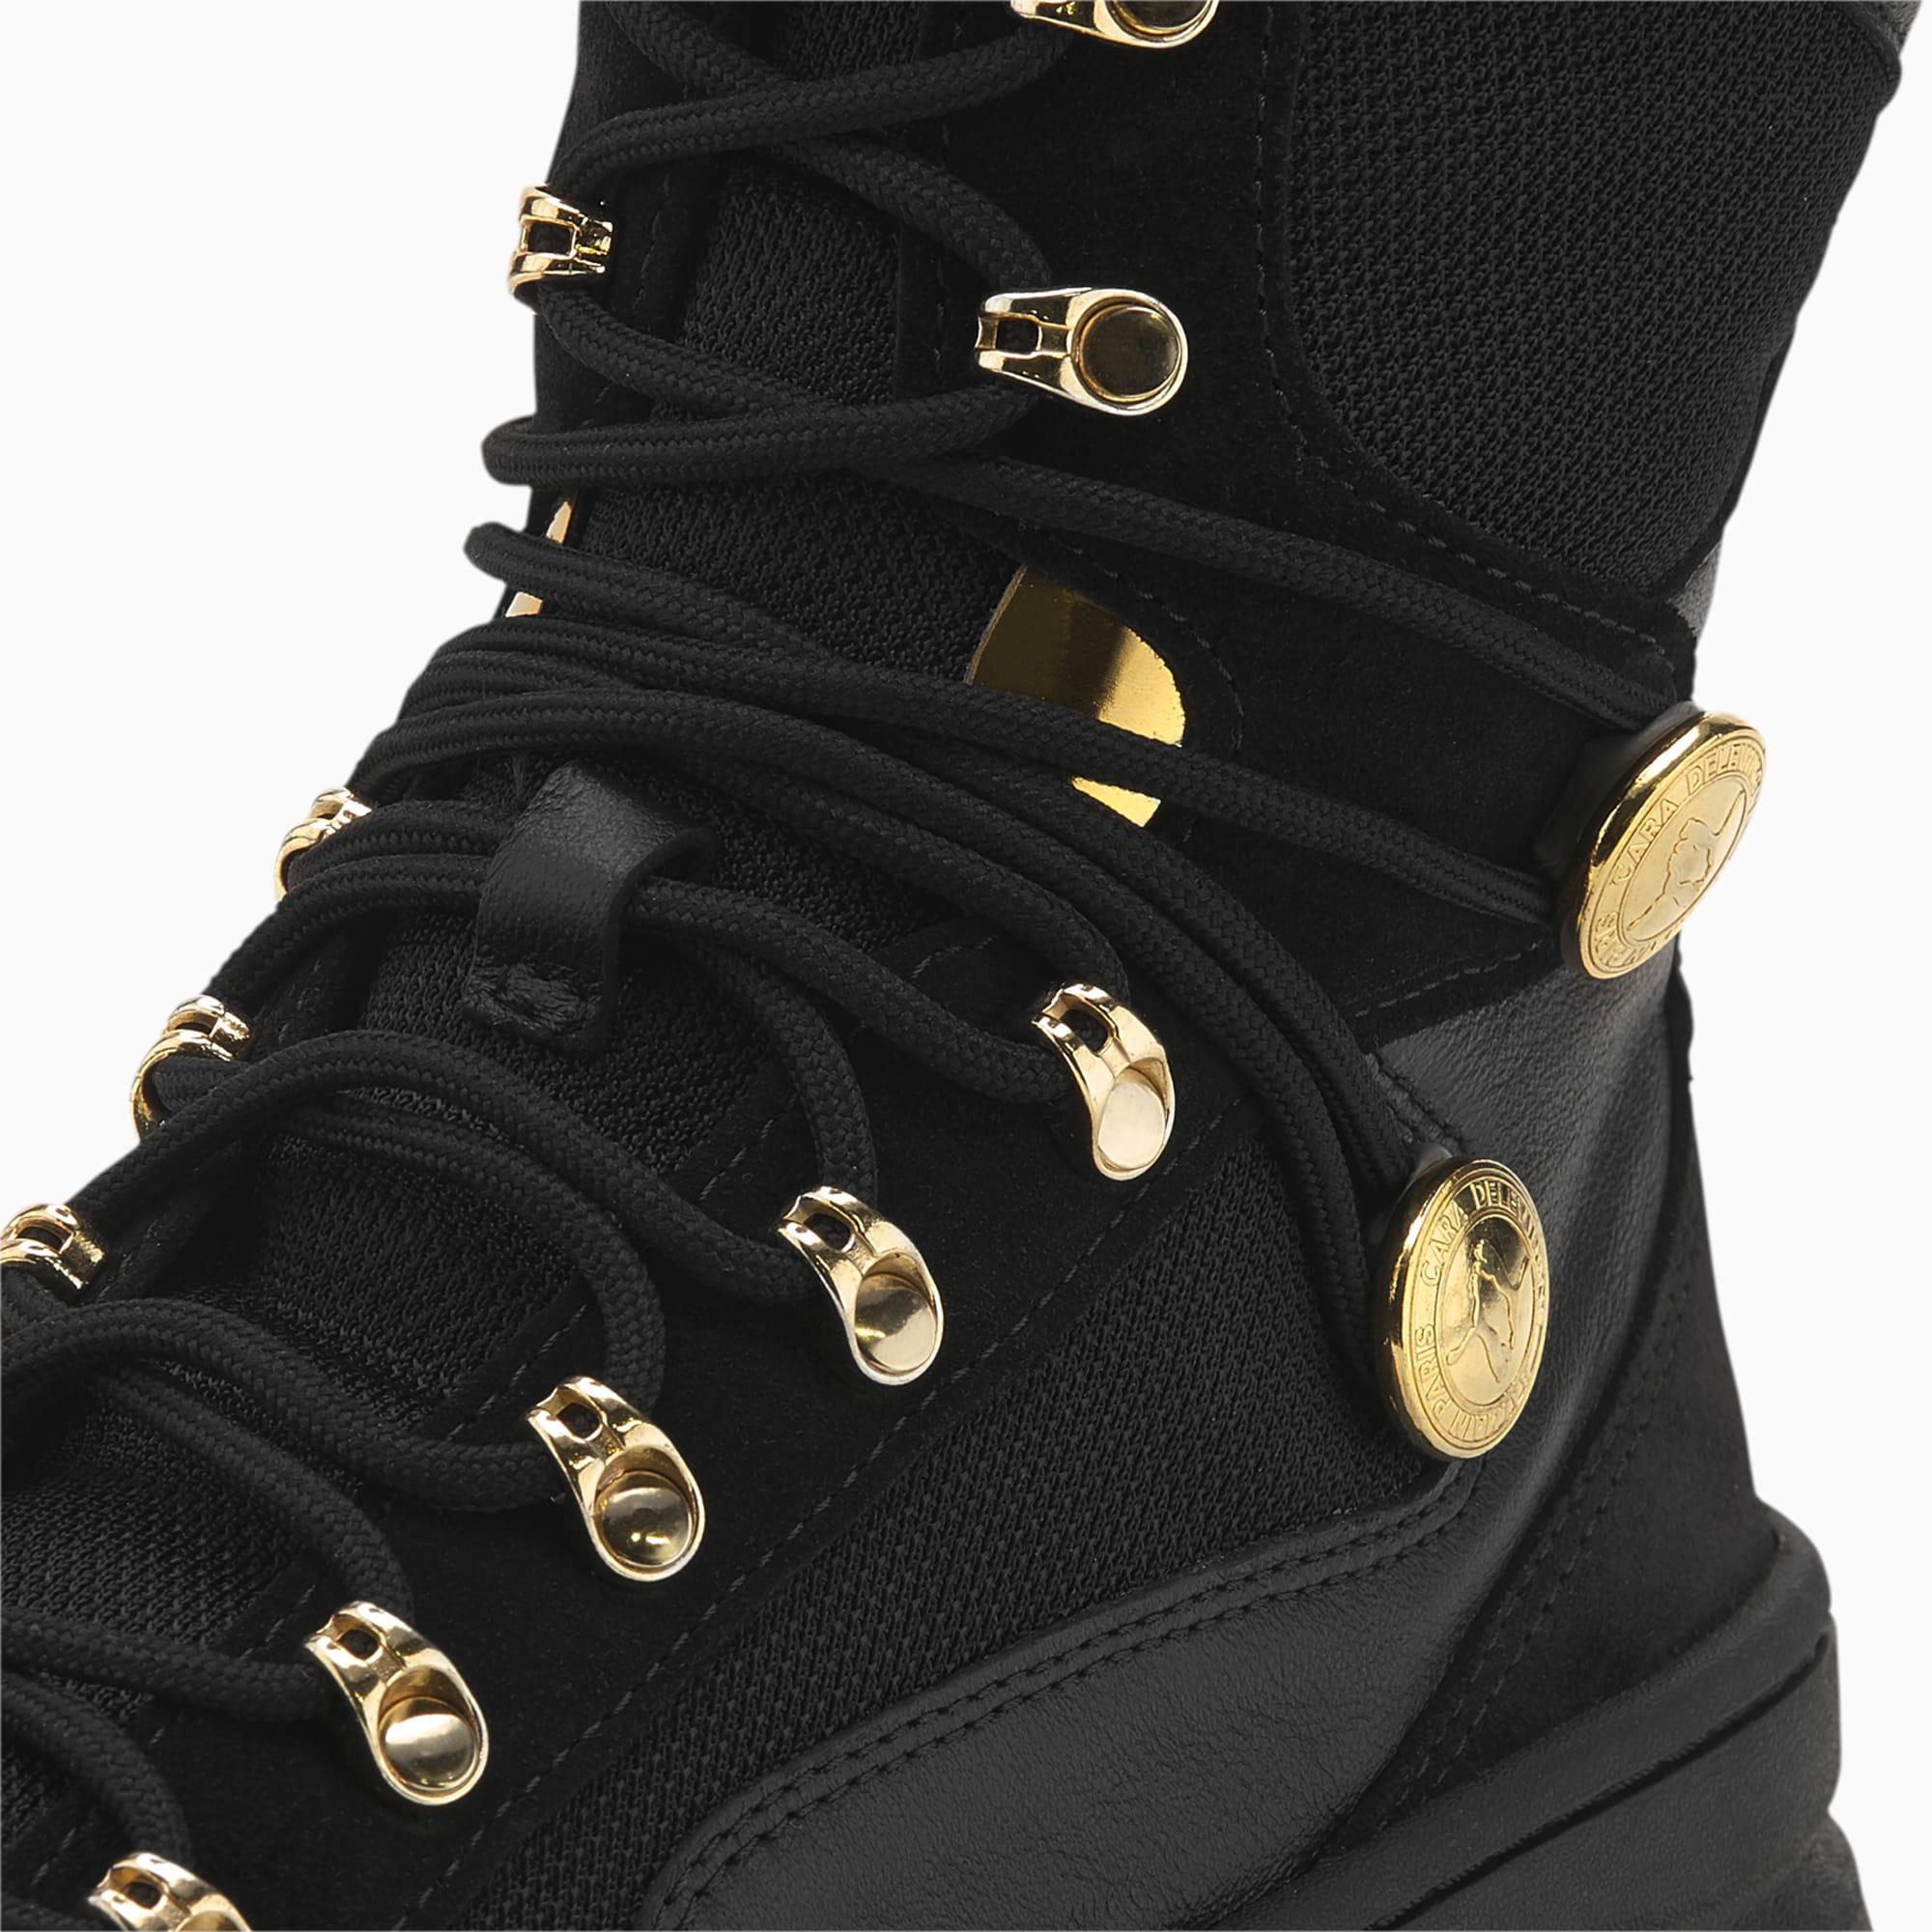 PUMA x BALMAIN DEVA støvler til kvinder